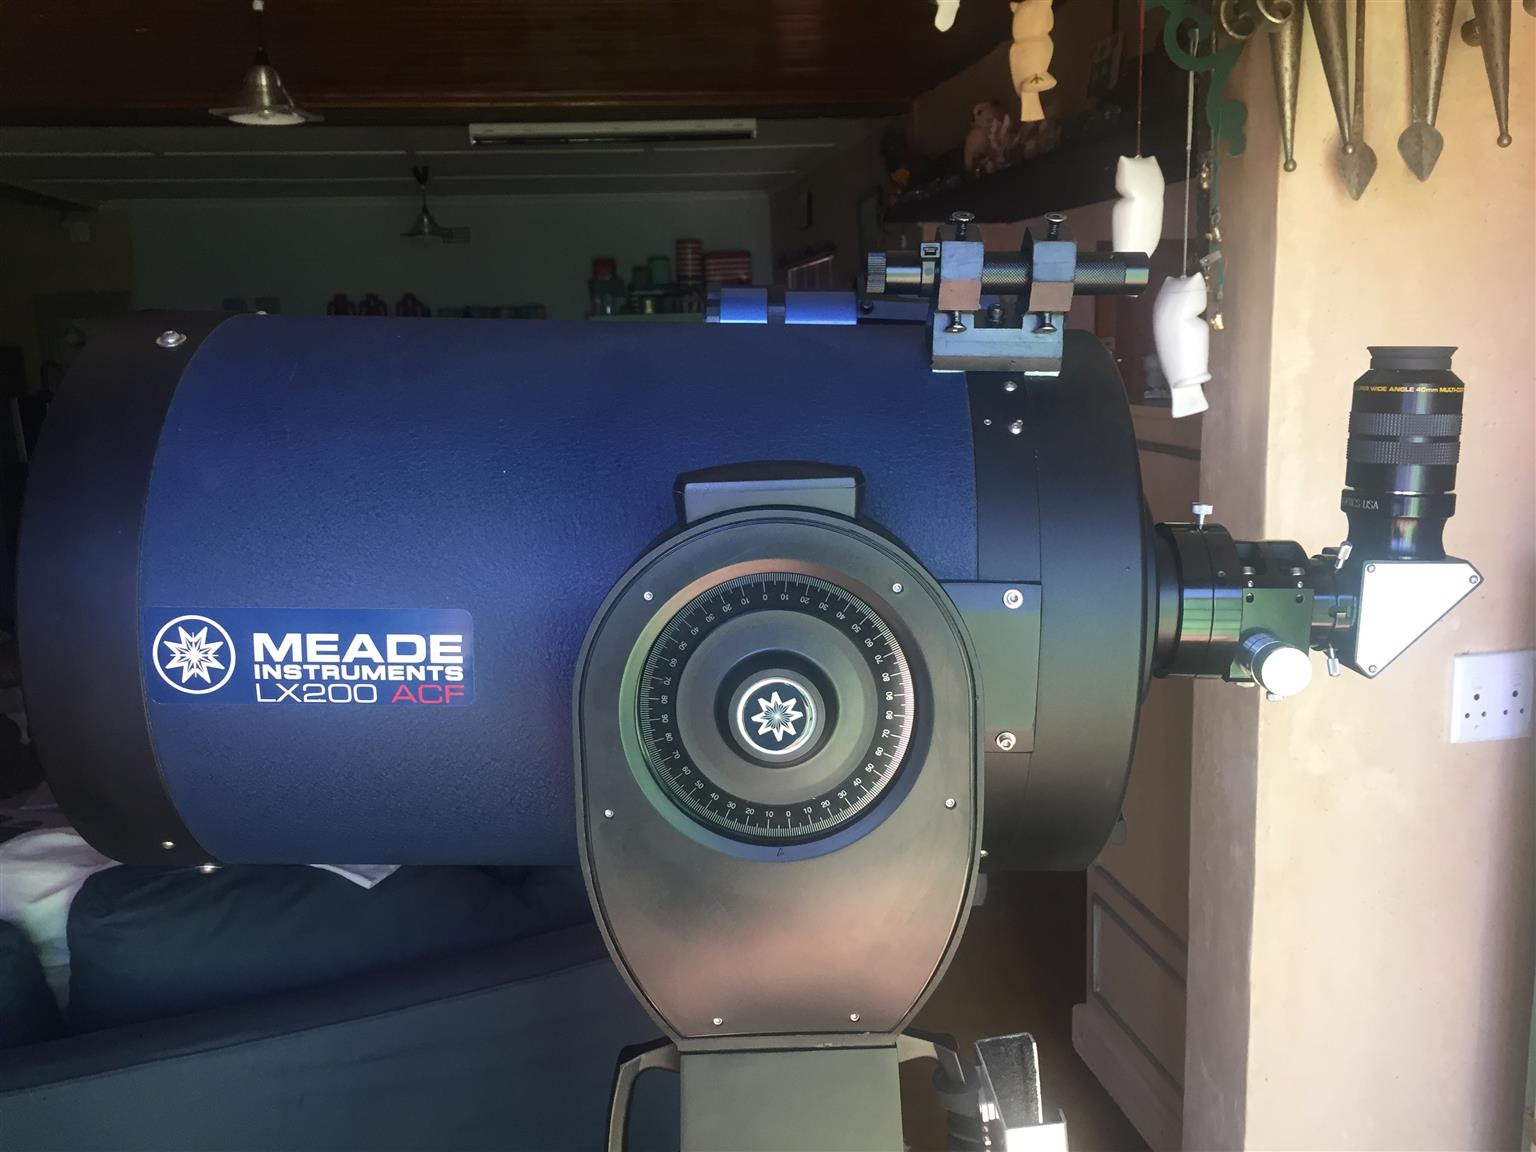 "Meade 12"" SCT GPS LX200 Telescope | Junk Mail"